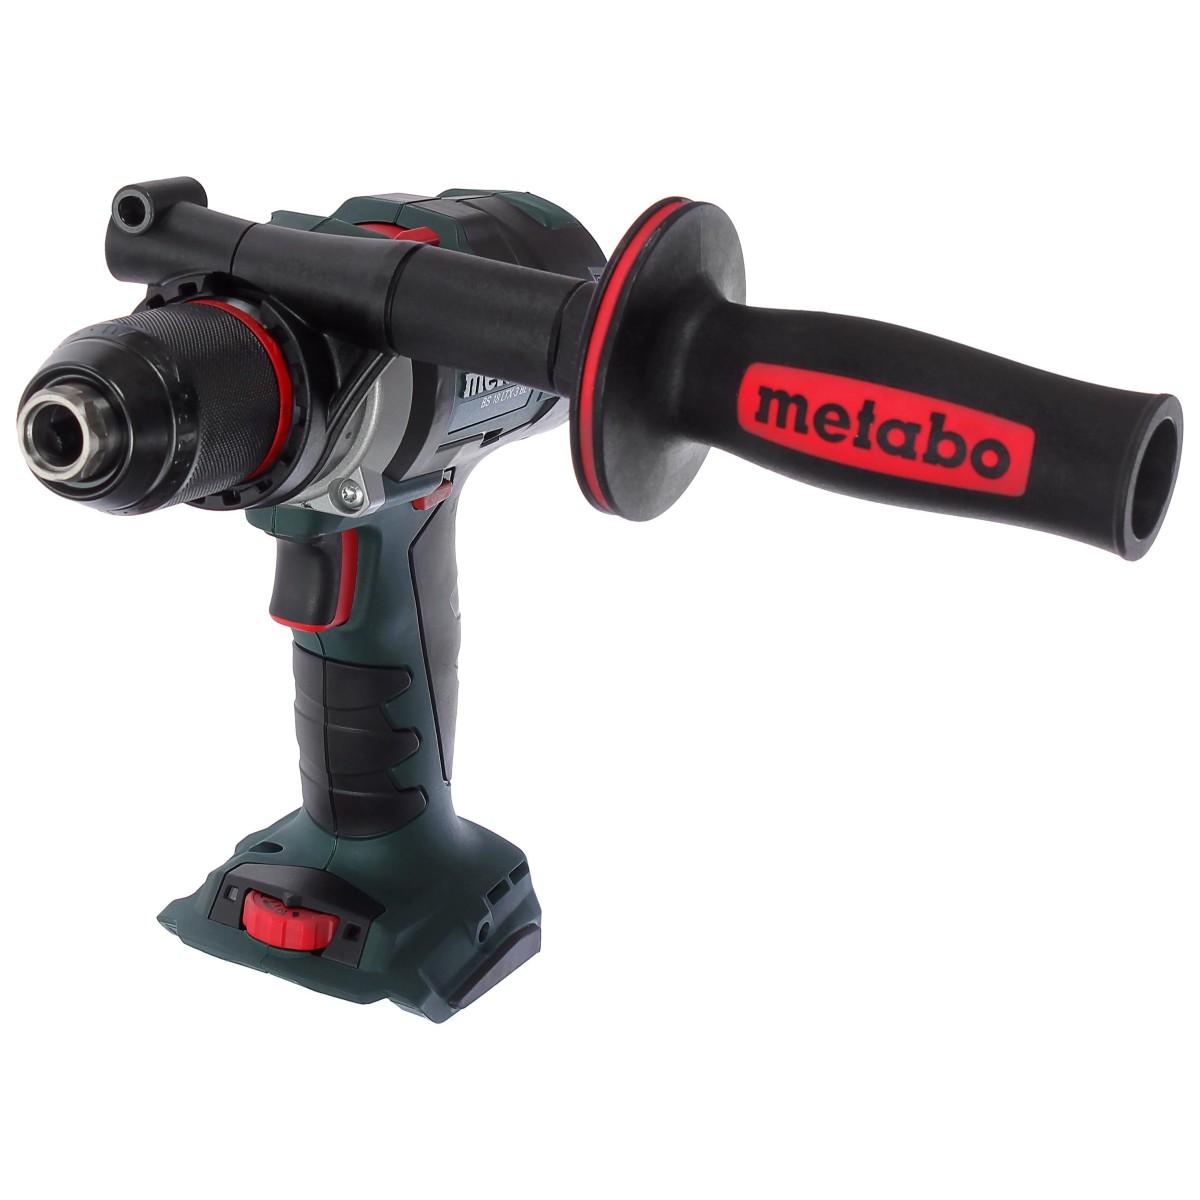 Дрель-шуруповерт аккумуляторная Metabo BS 18 LTX-3 BL I 602354840